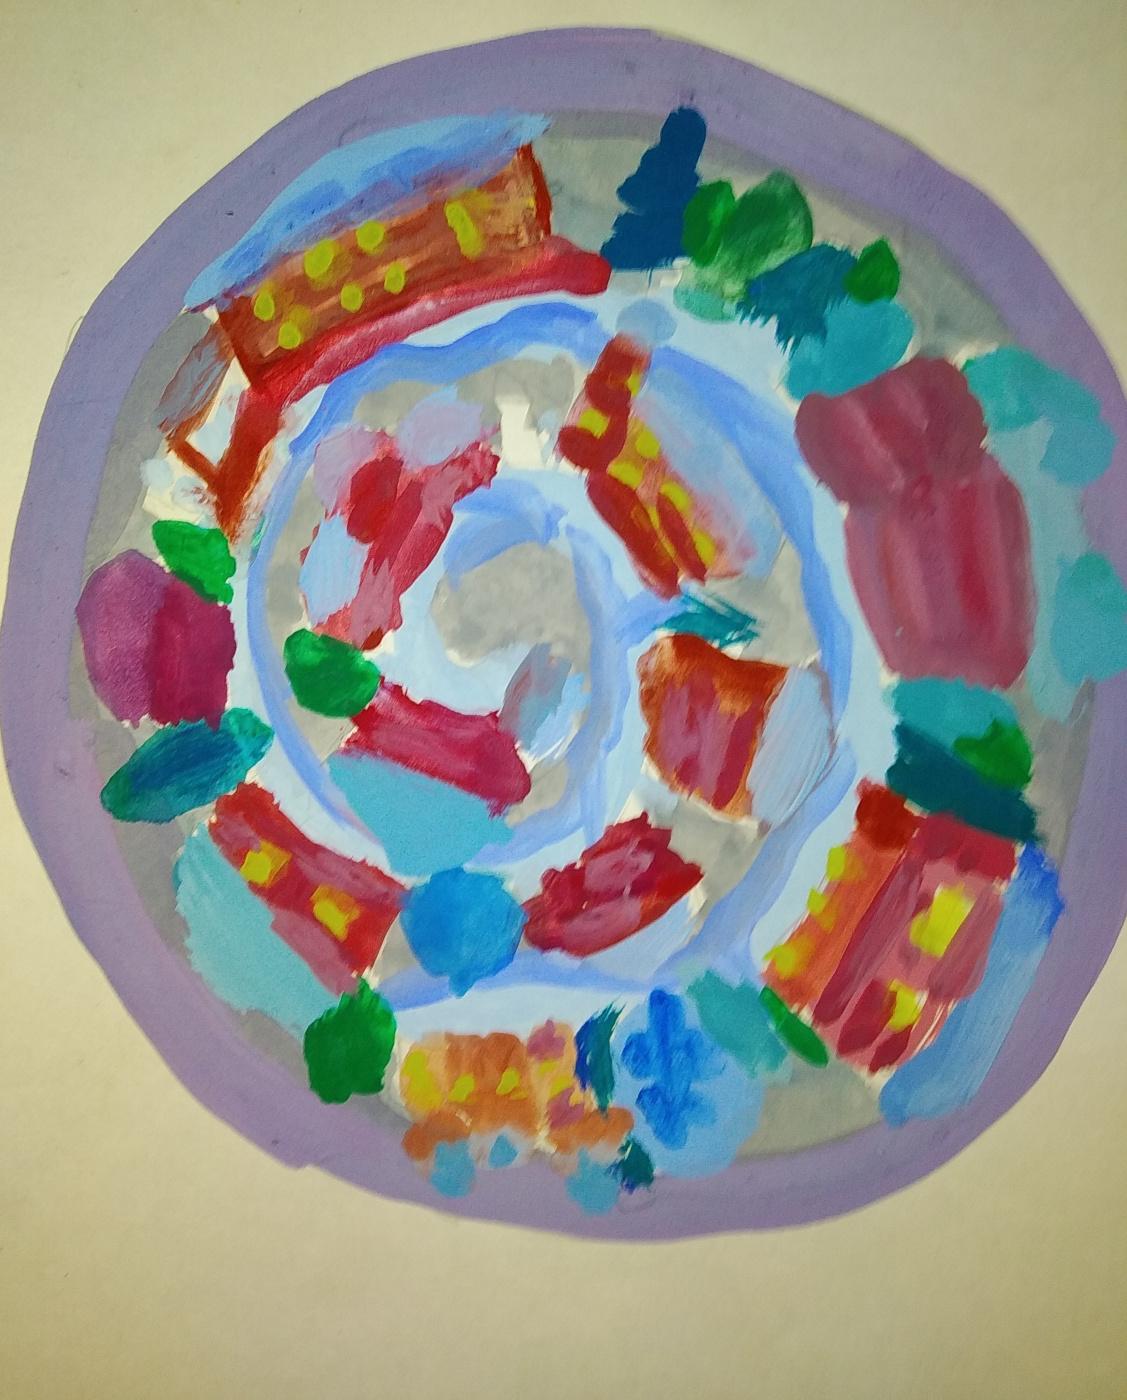 Zina Vladimirovna Parisva. Christmas plate sketch